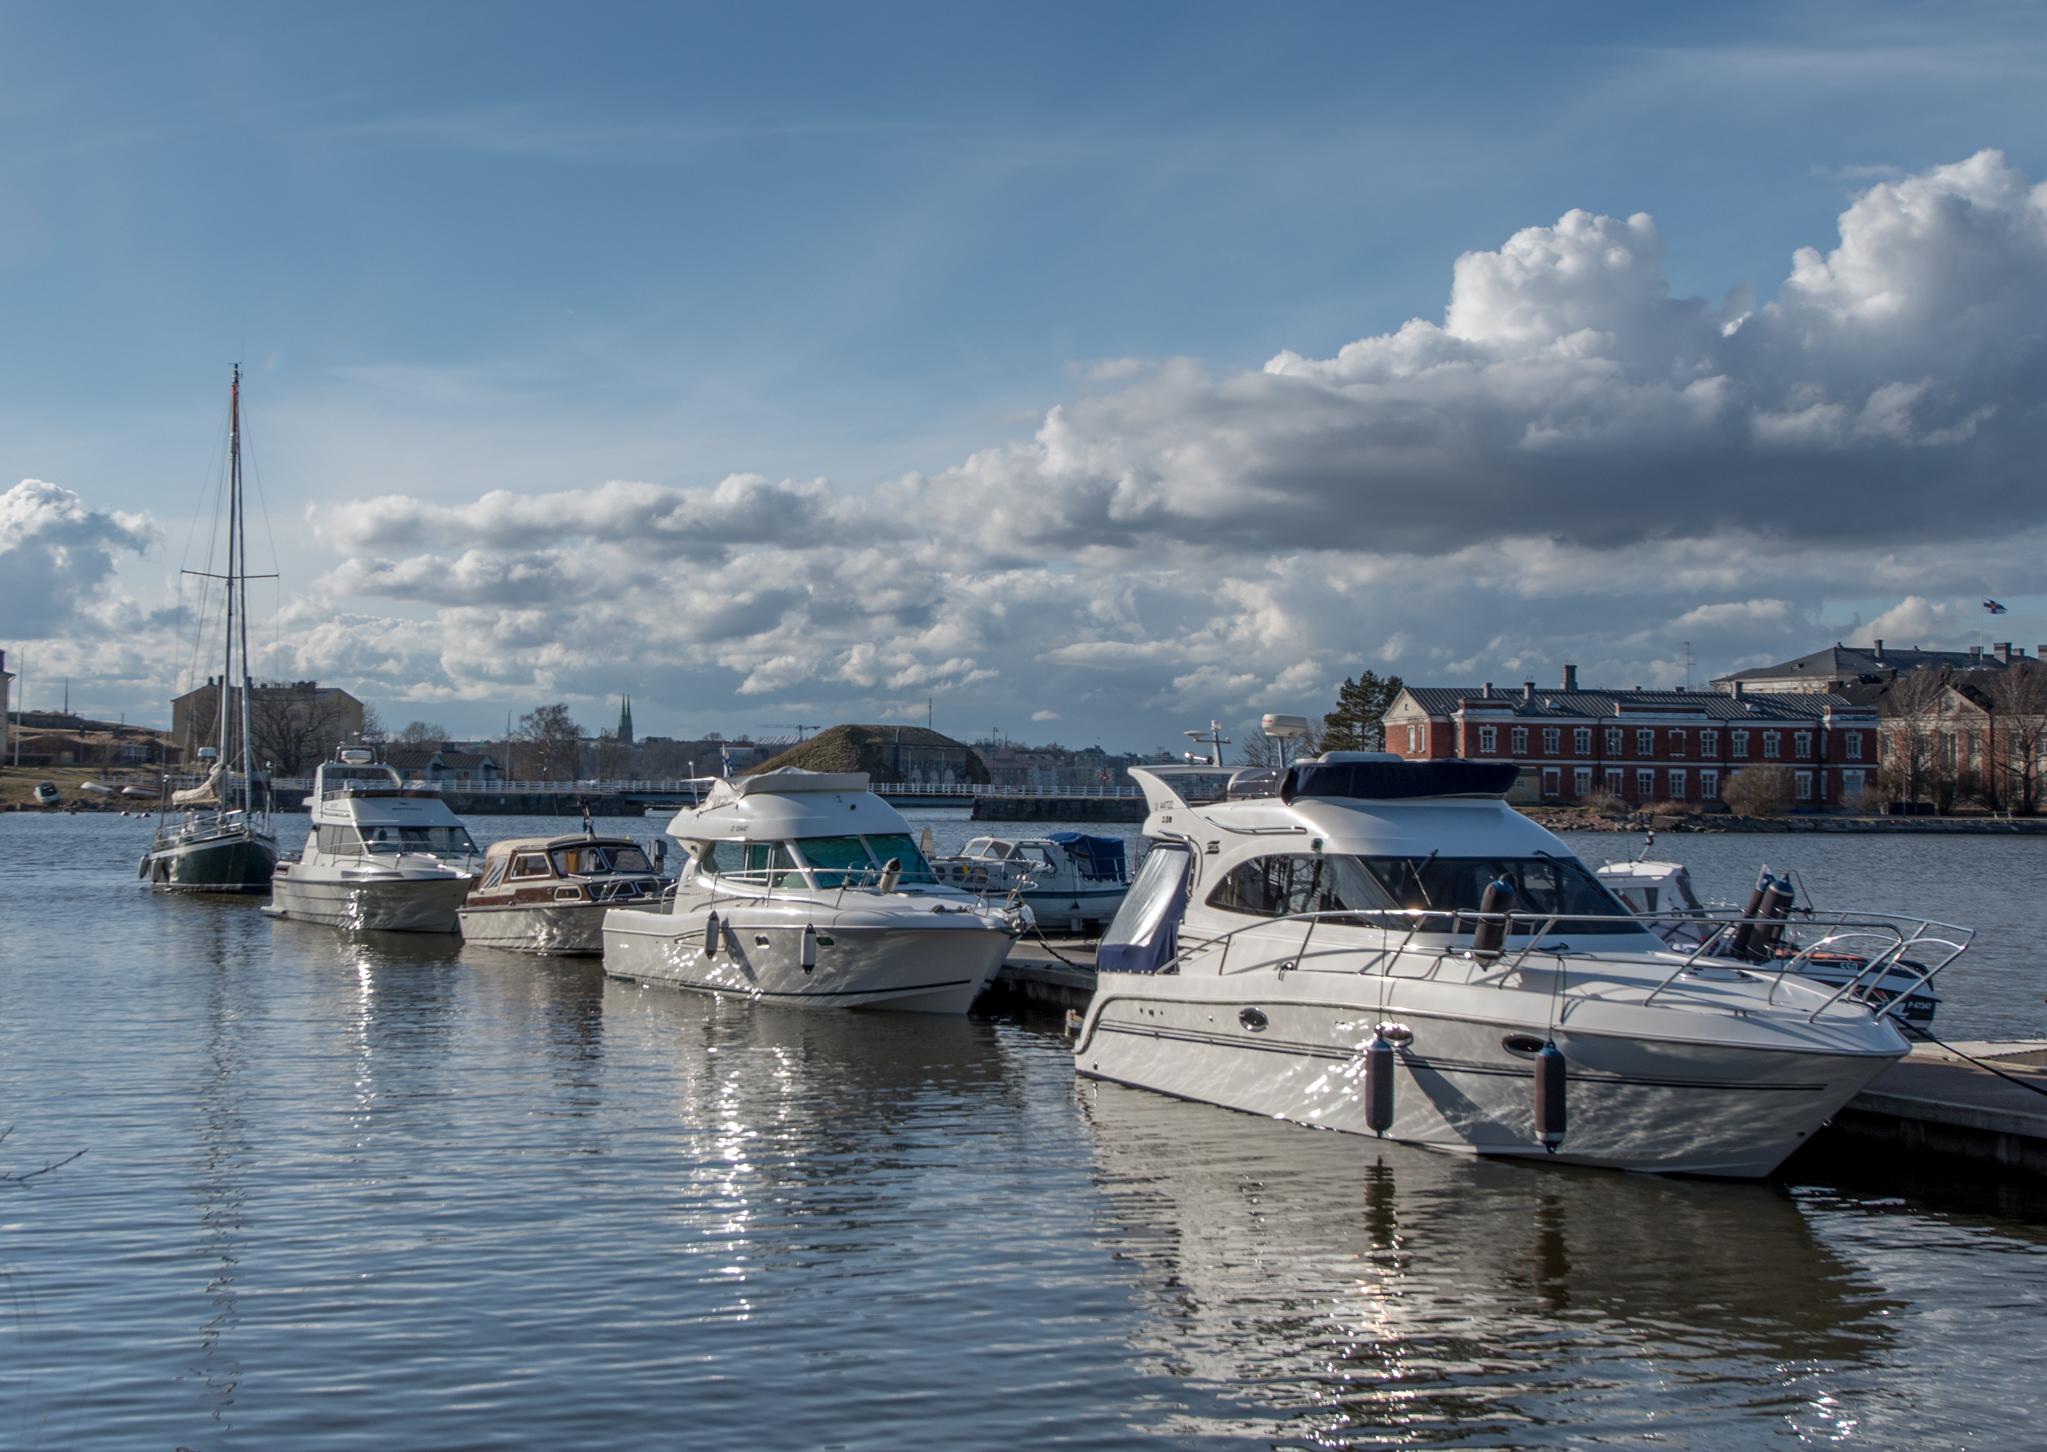 20180428_175148_Suomenlinna_Veneretki